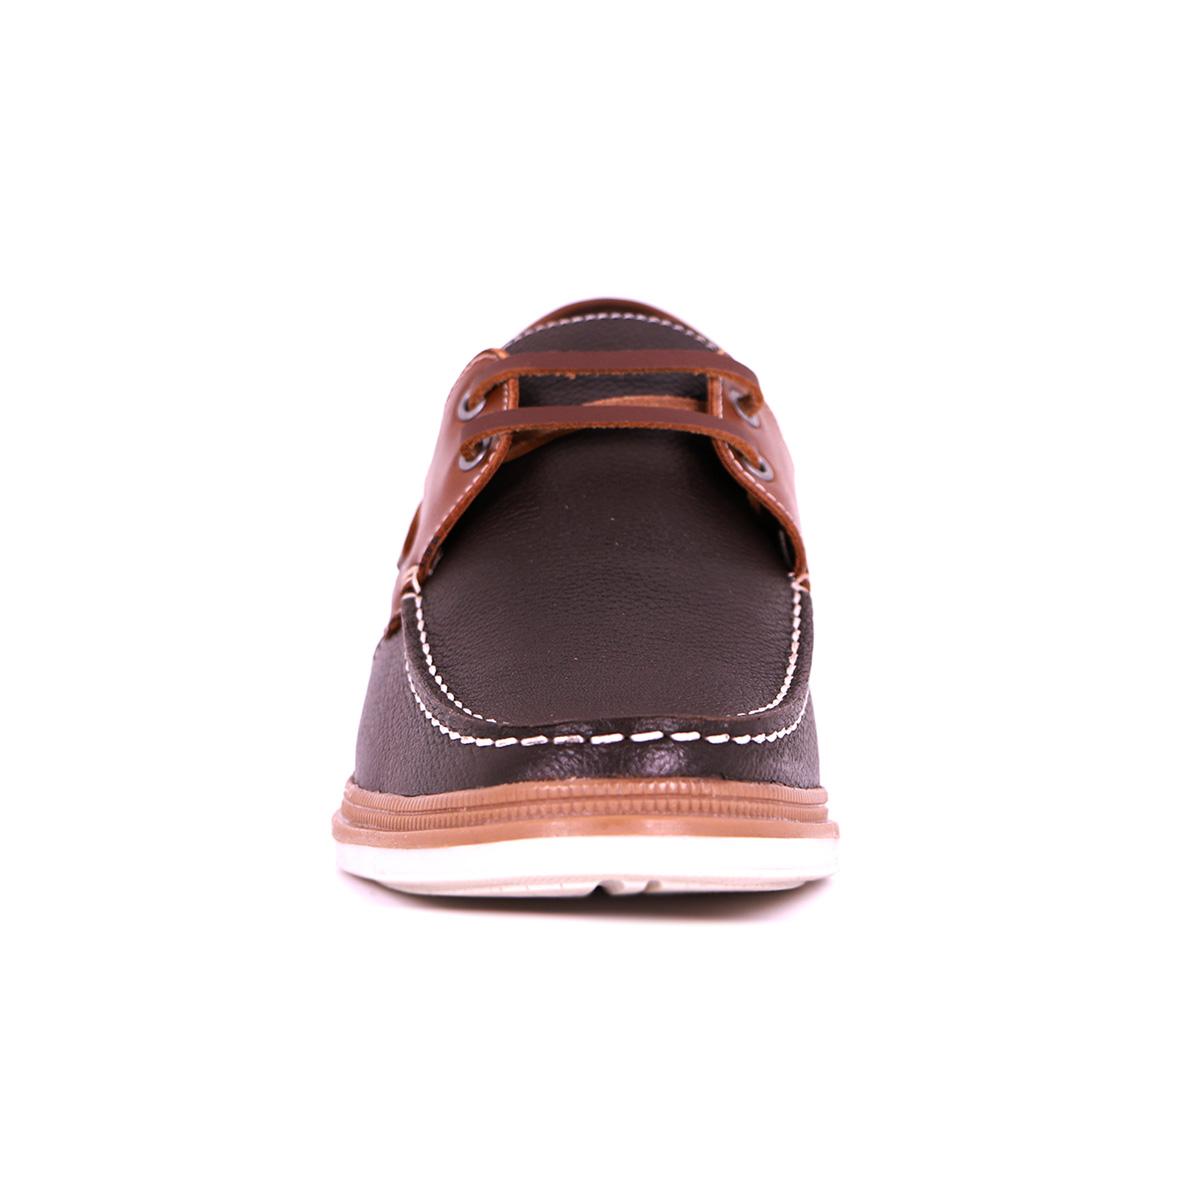 Zapato Casual Walk Café/Café Max Denegri +7cms De Altura_73408